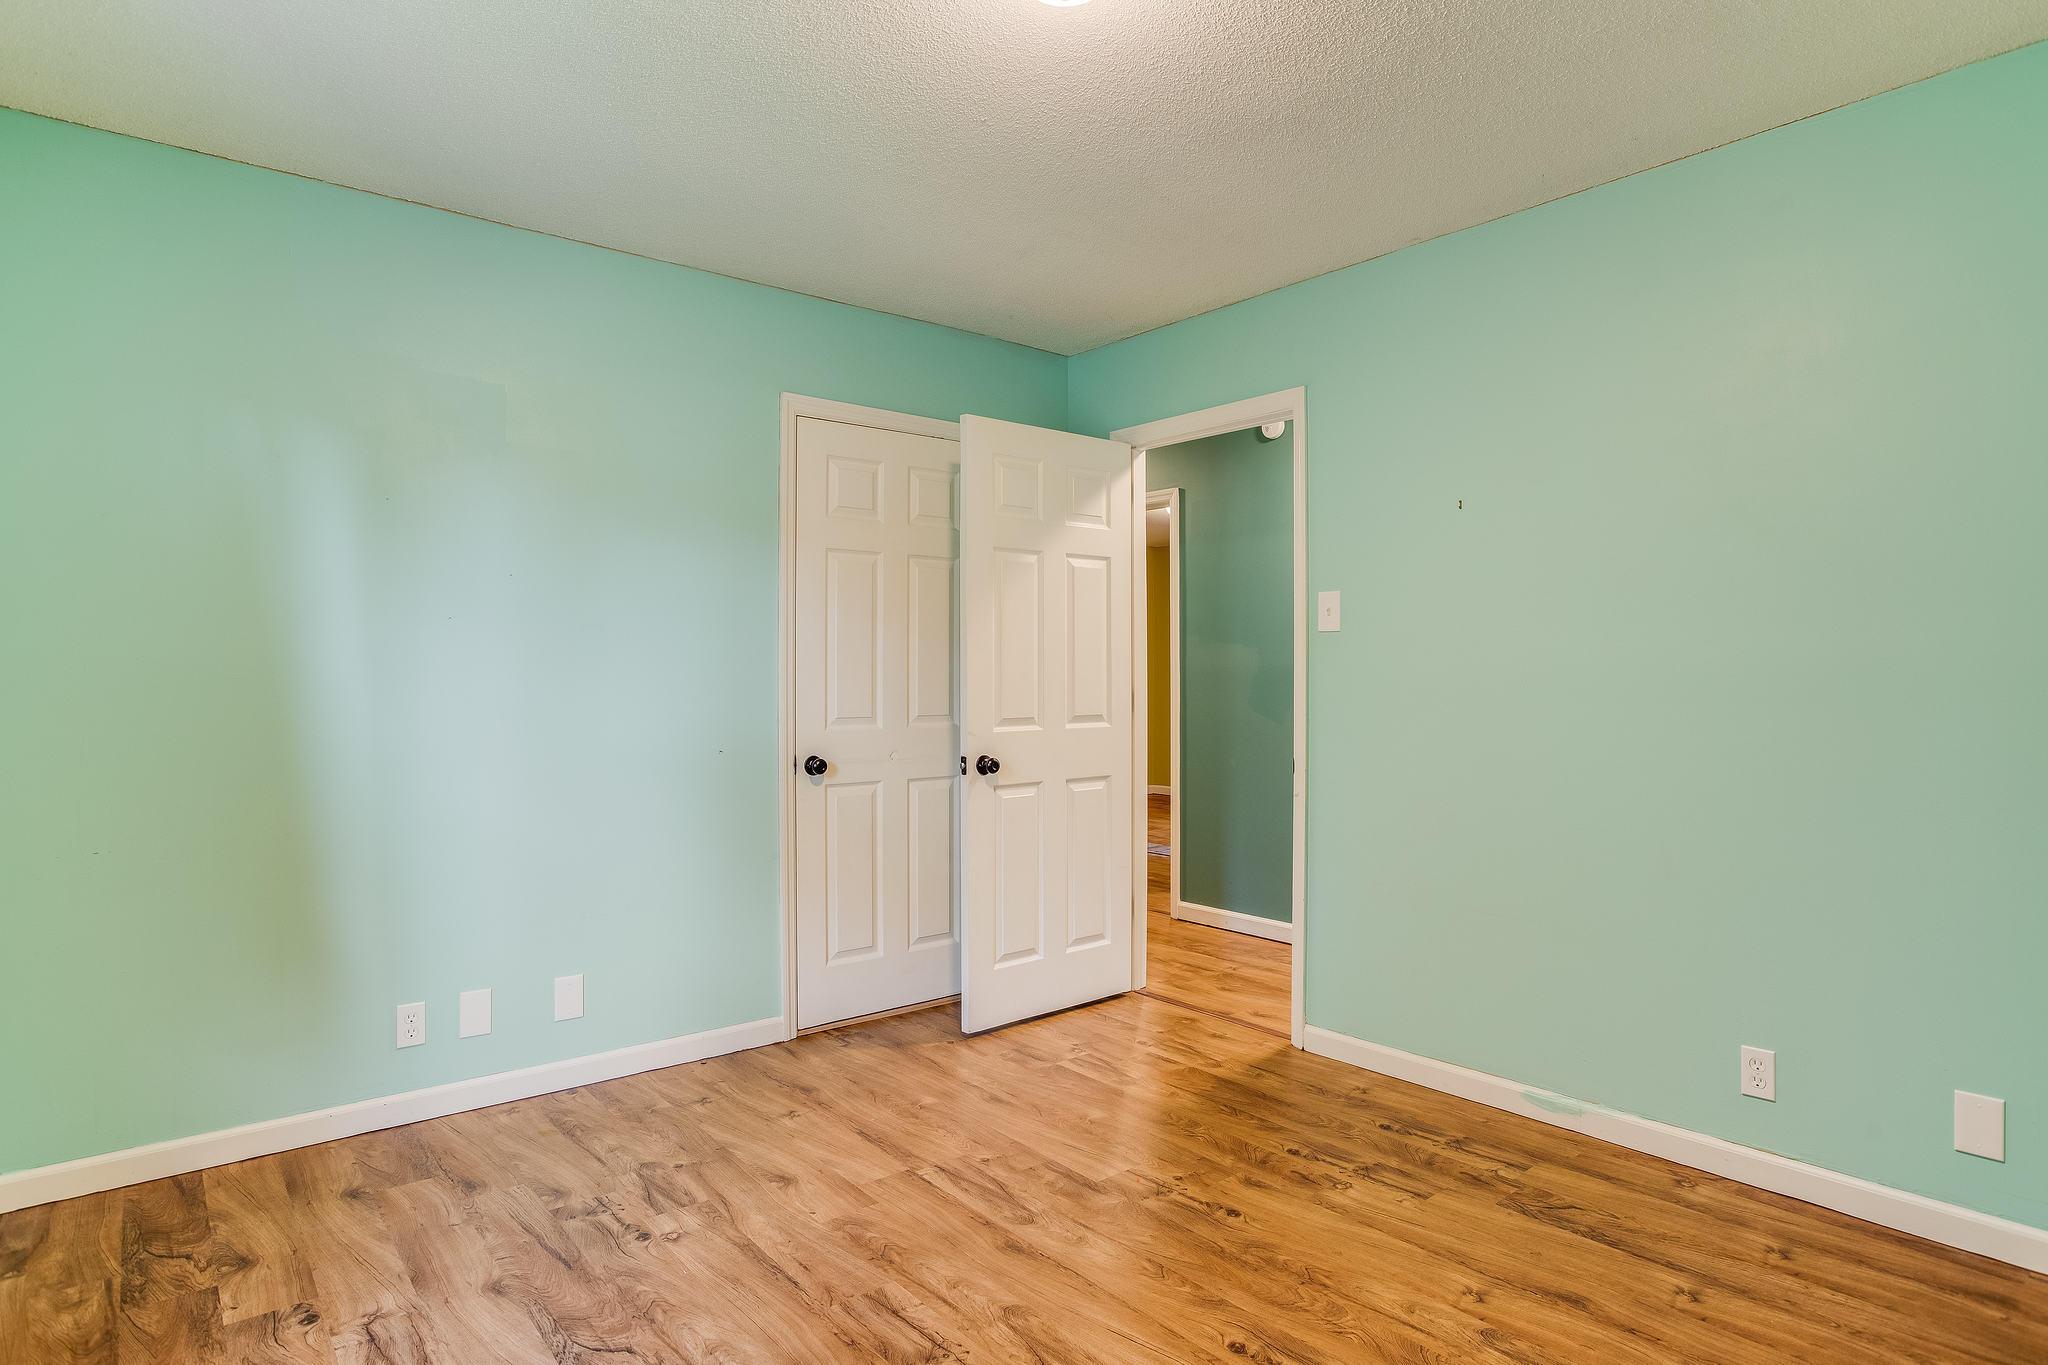 504 Bobolink Rd bedroom 3 (2)